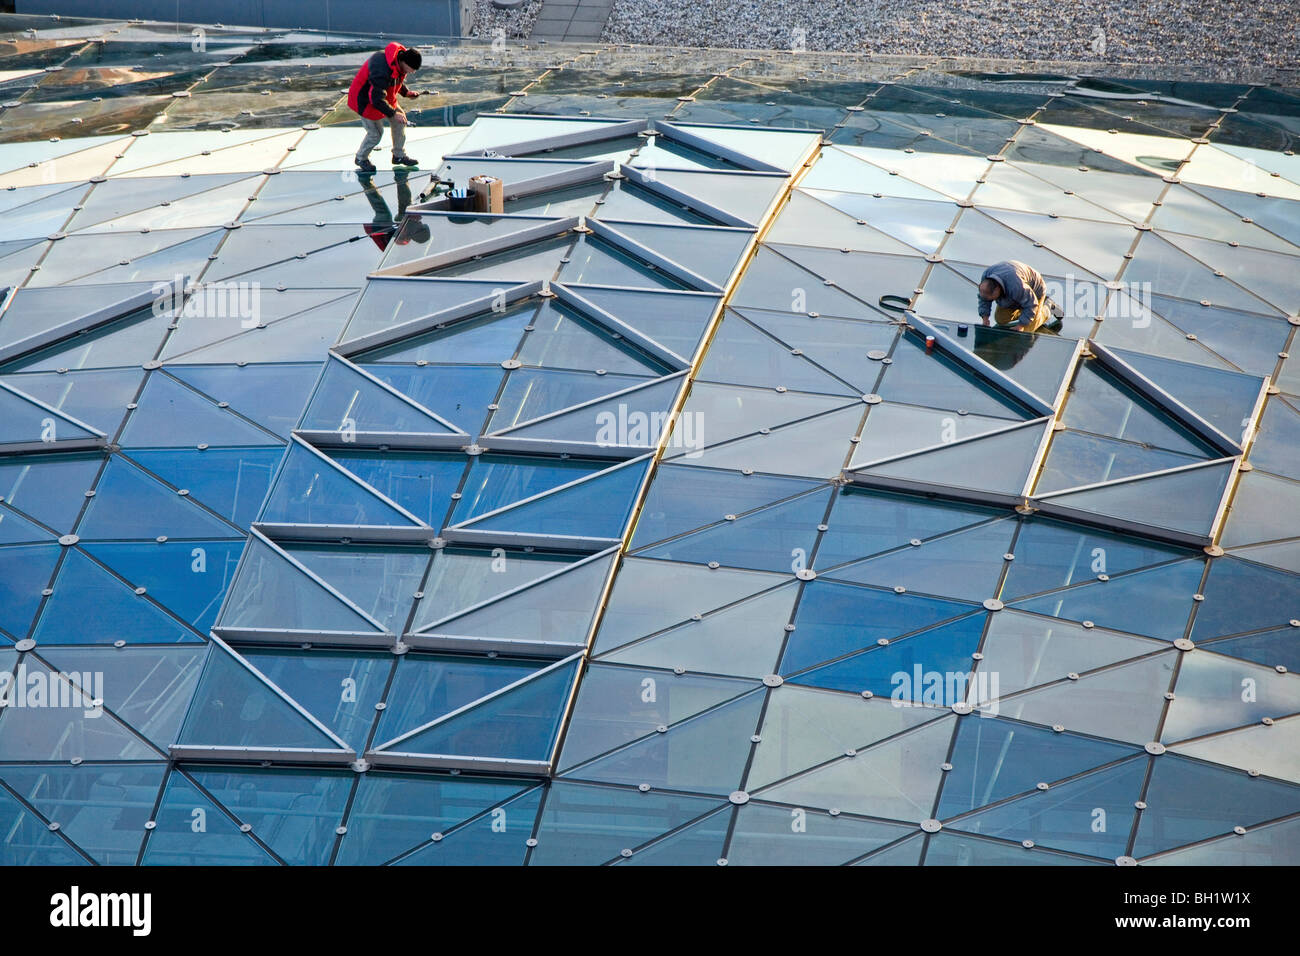 repairing glass roof, Potsdam Platz, Berlin Germany - Stock Image